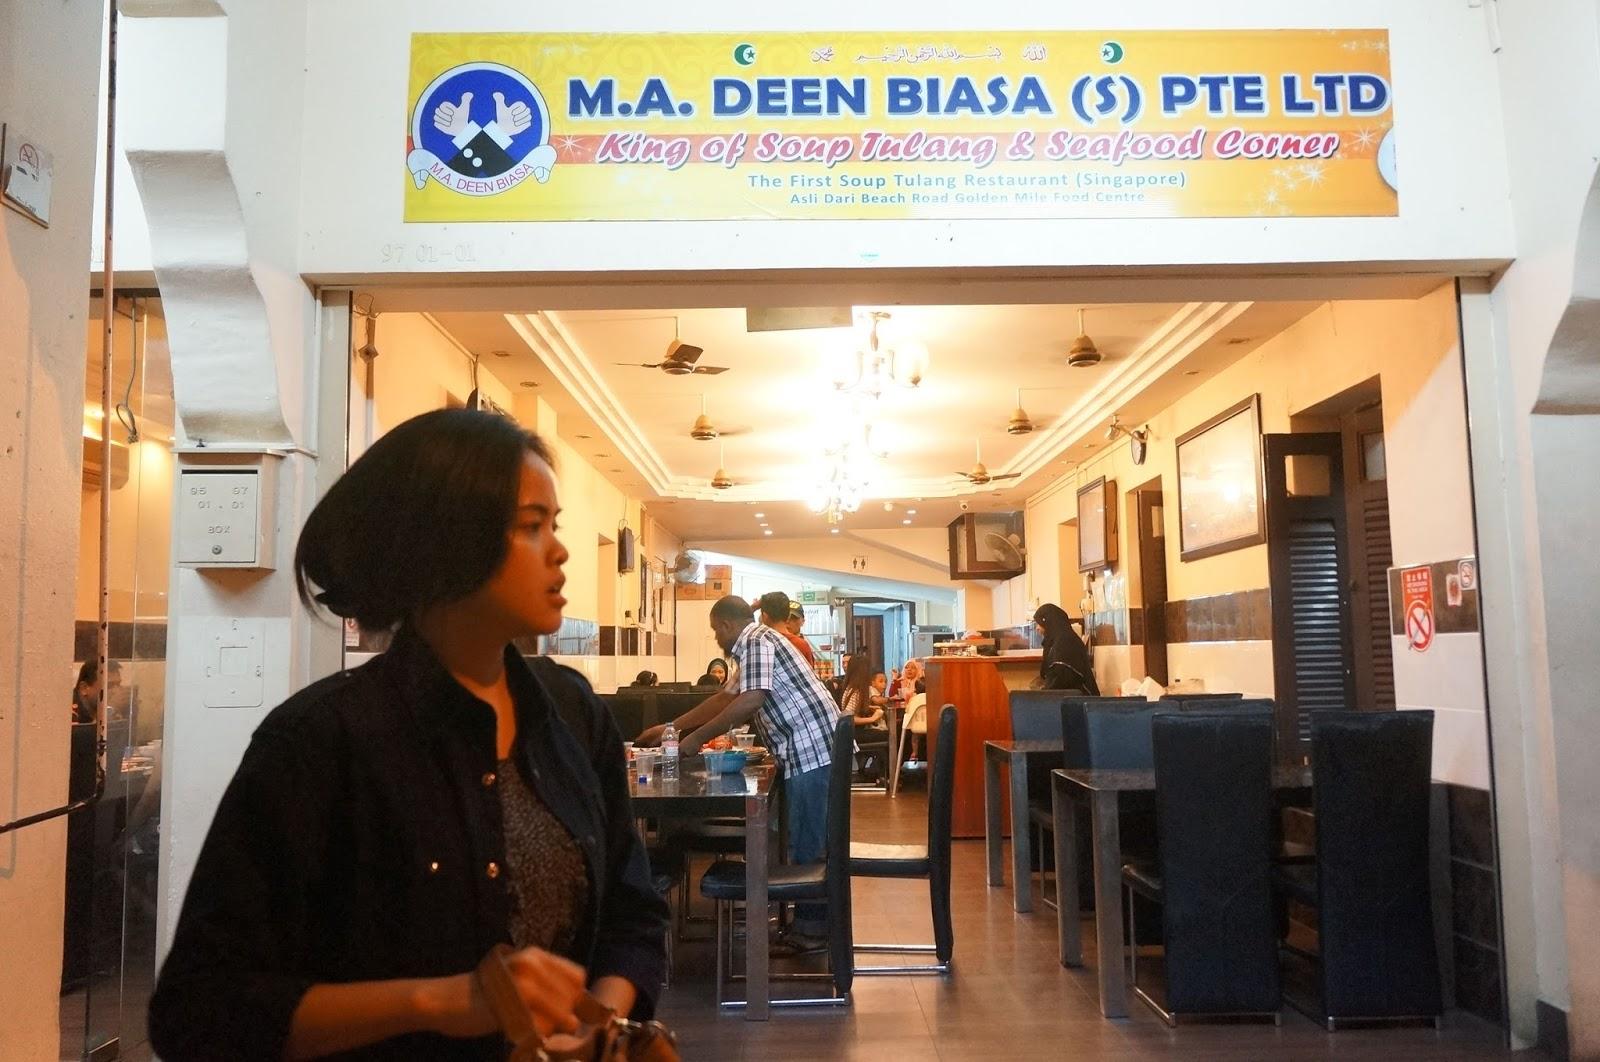 Pecinta Martabak Wajib Mampir Ke Resto Zam Di Daerah Bugis Kampong Glam Seberang Masjid Sultan Kami Pernah Beli Nasi Goreng Mi Dan